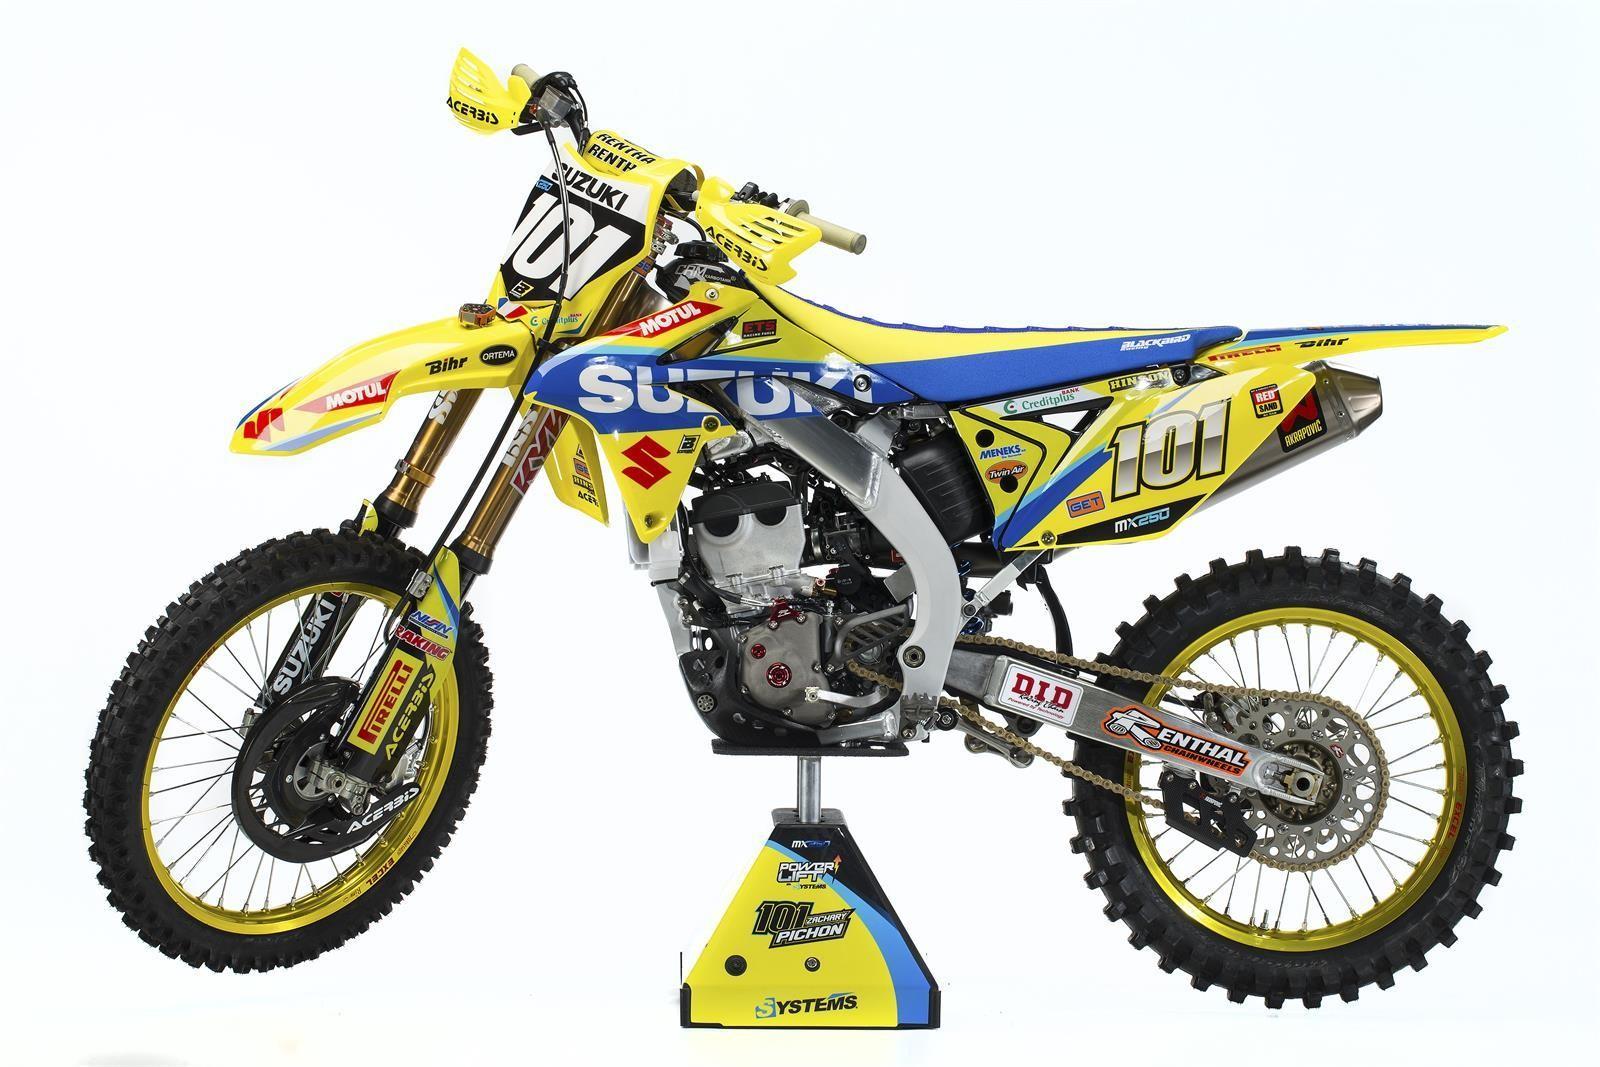 Zachary Pichon's 2017 Suzuki World MX2 RM-Z250 - First Look: 2017 Suzuki World MX2 Team - Motocross Pictures - Vital MX